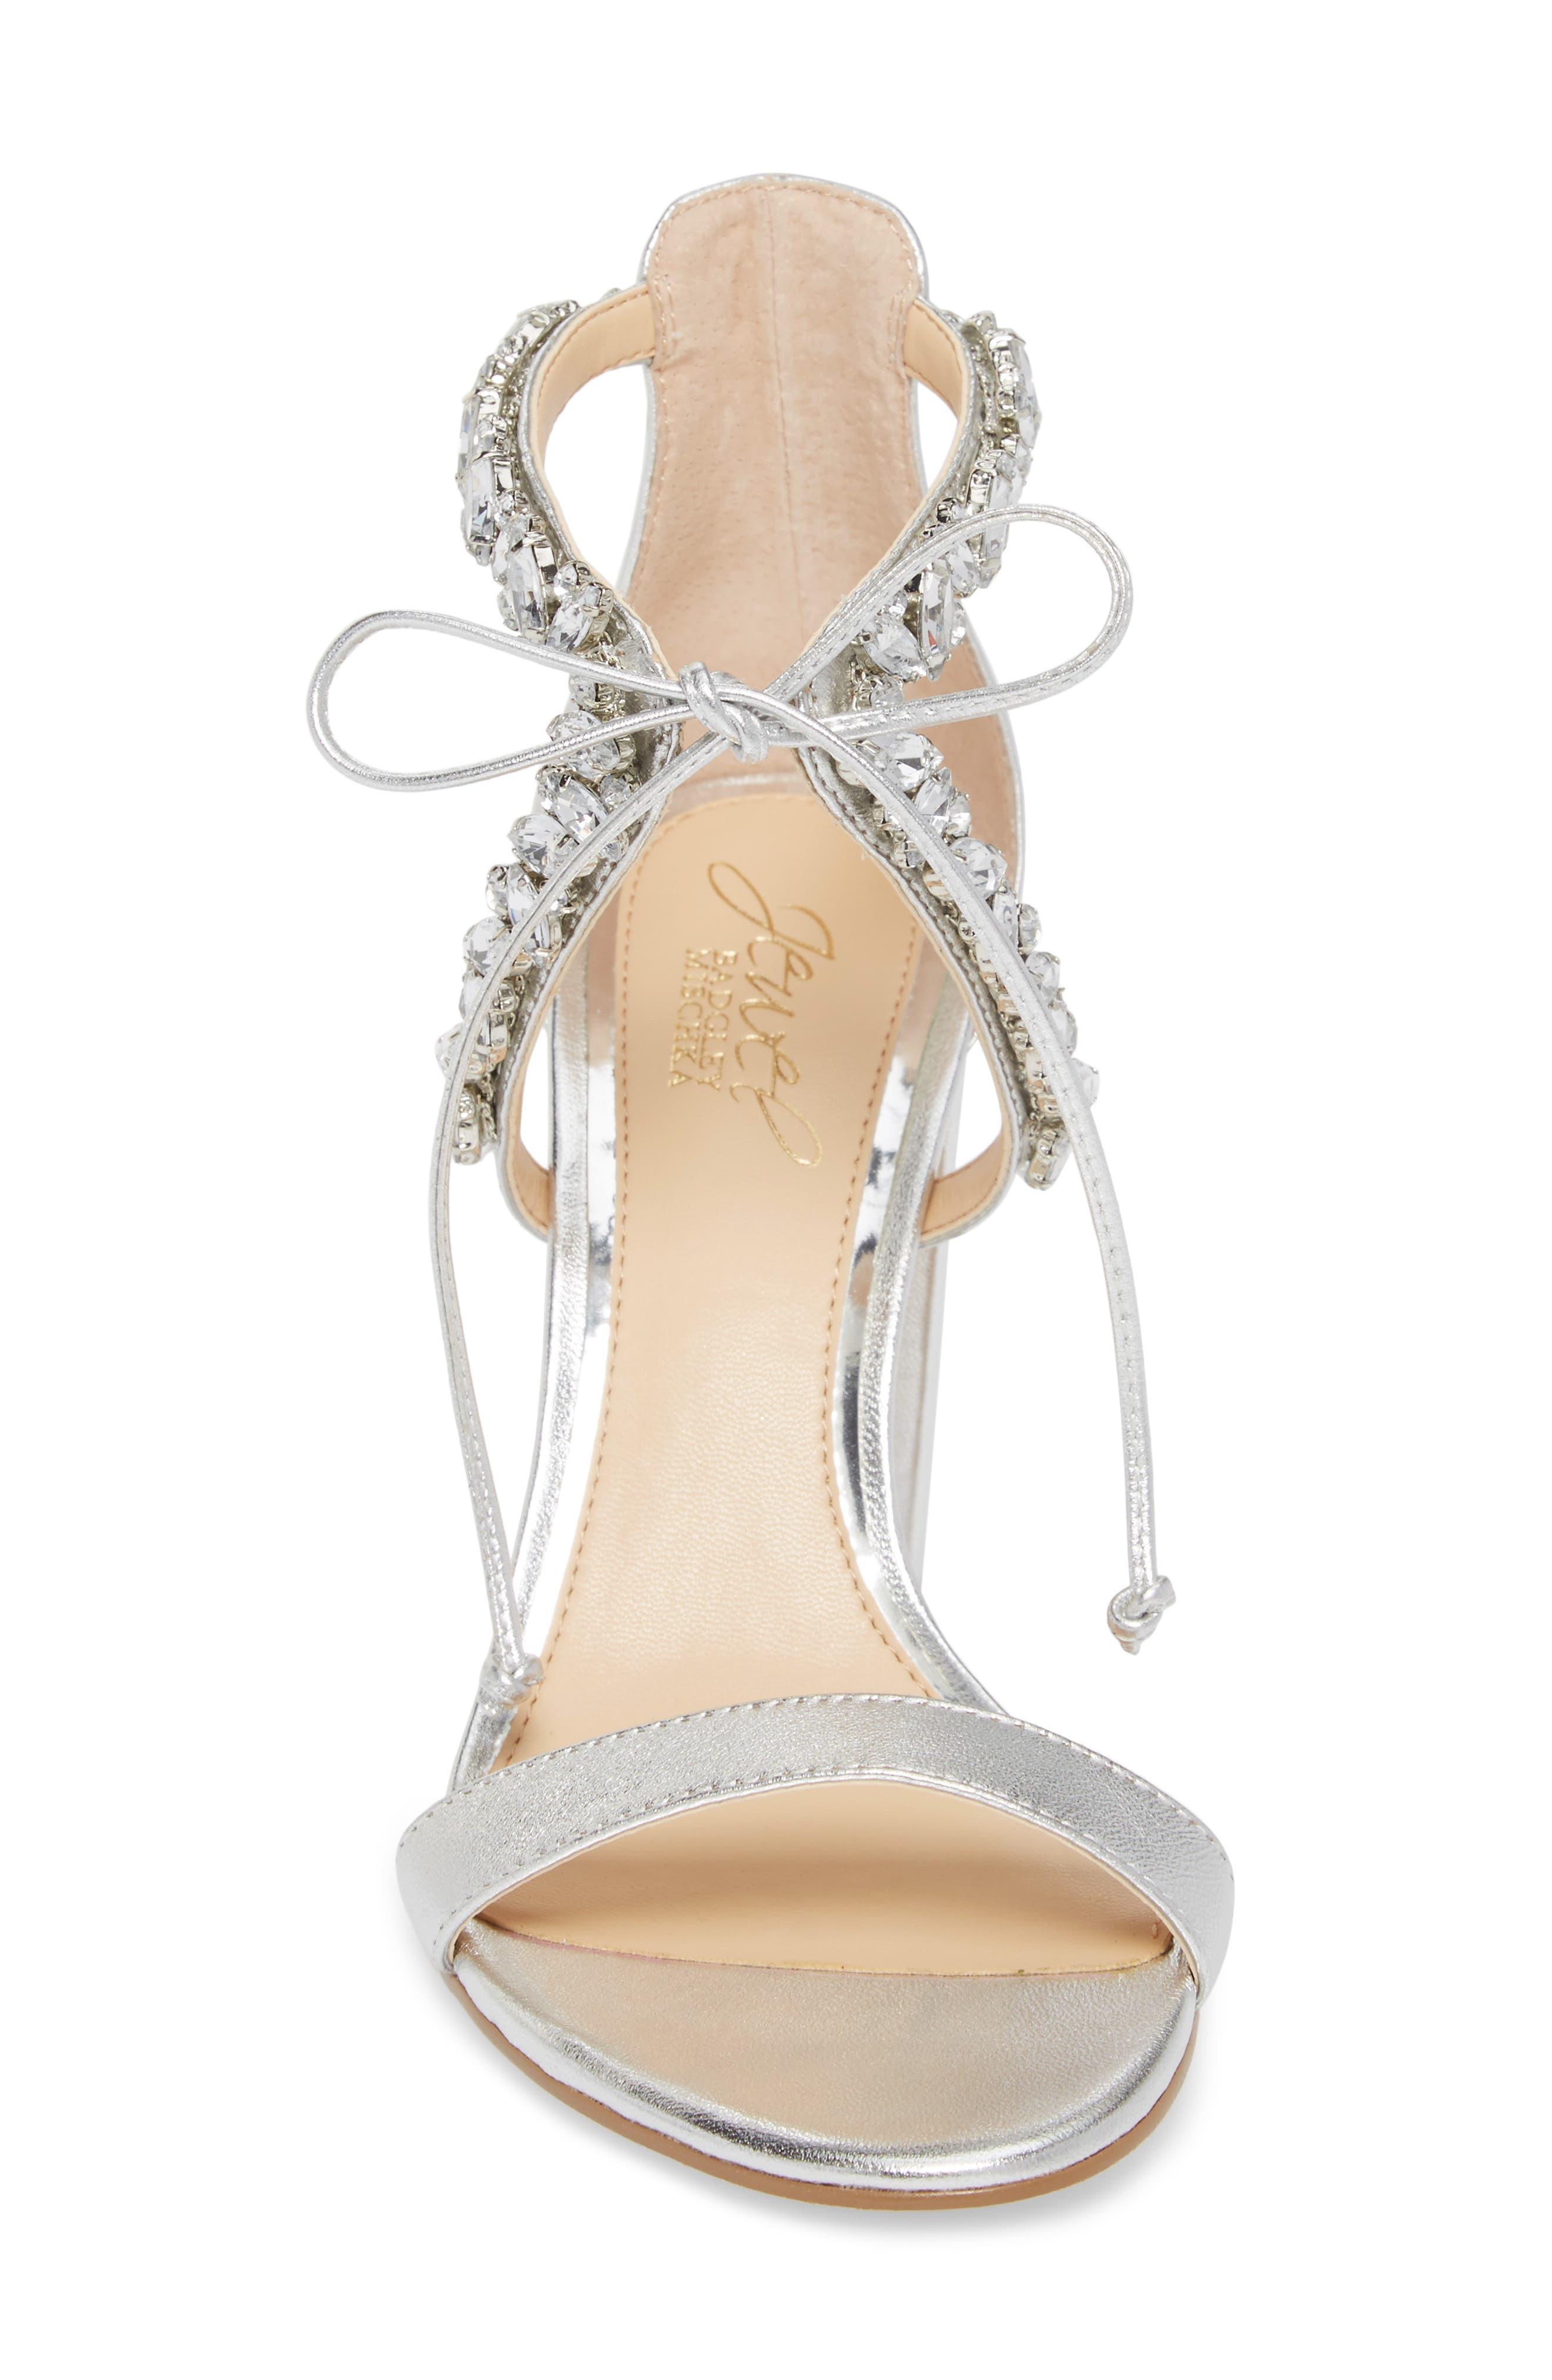 Thamar Embellished Sandal,                             Alternate thumbnail 4, color,                             Silver Leather